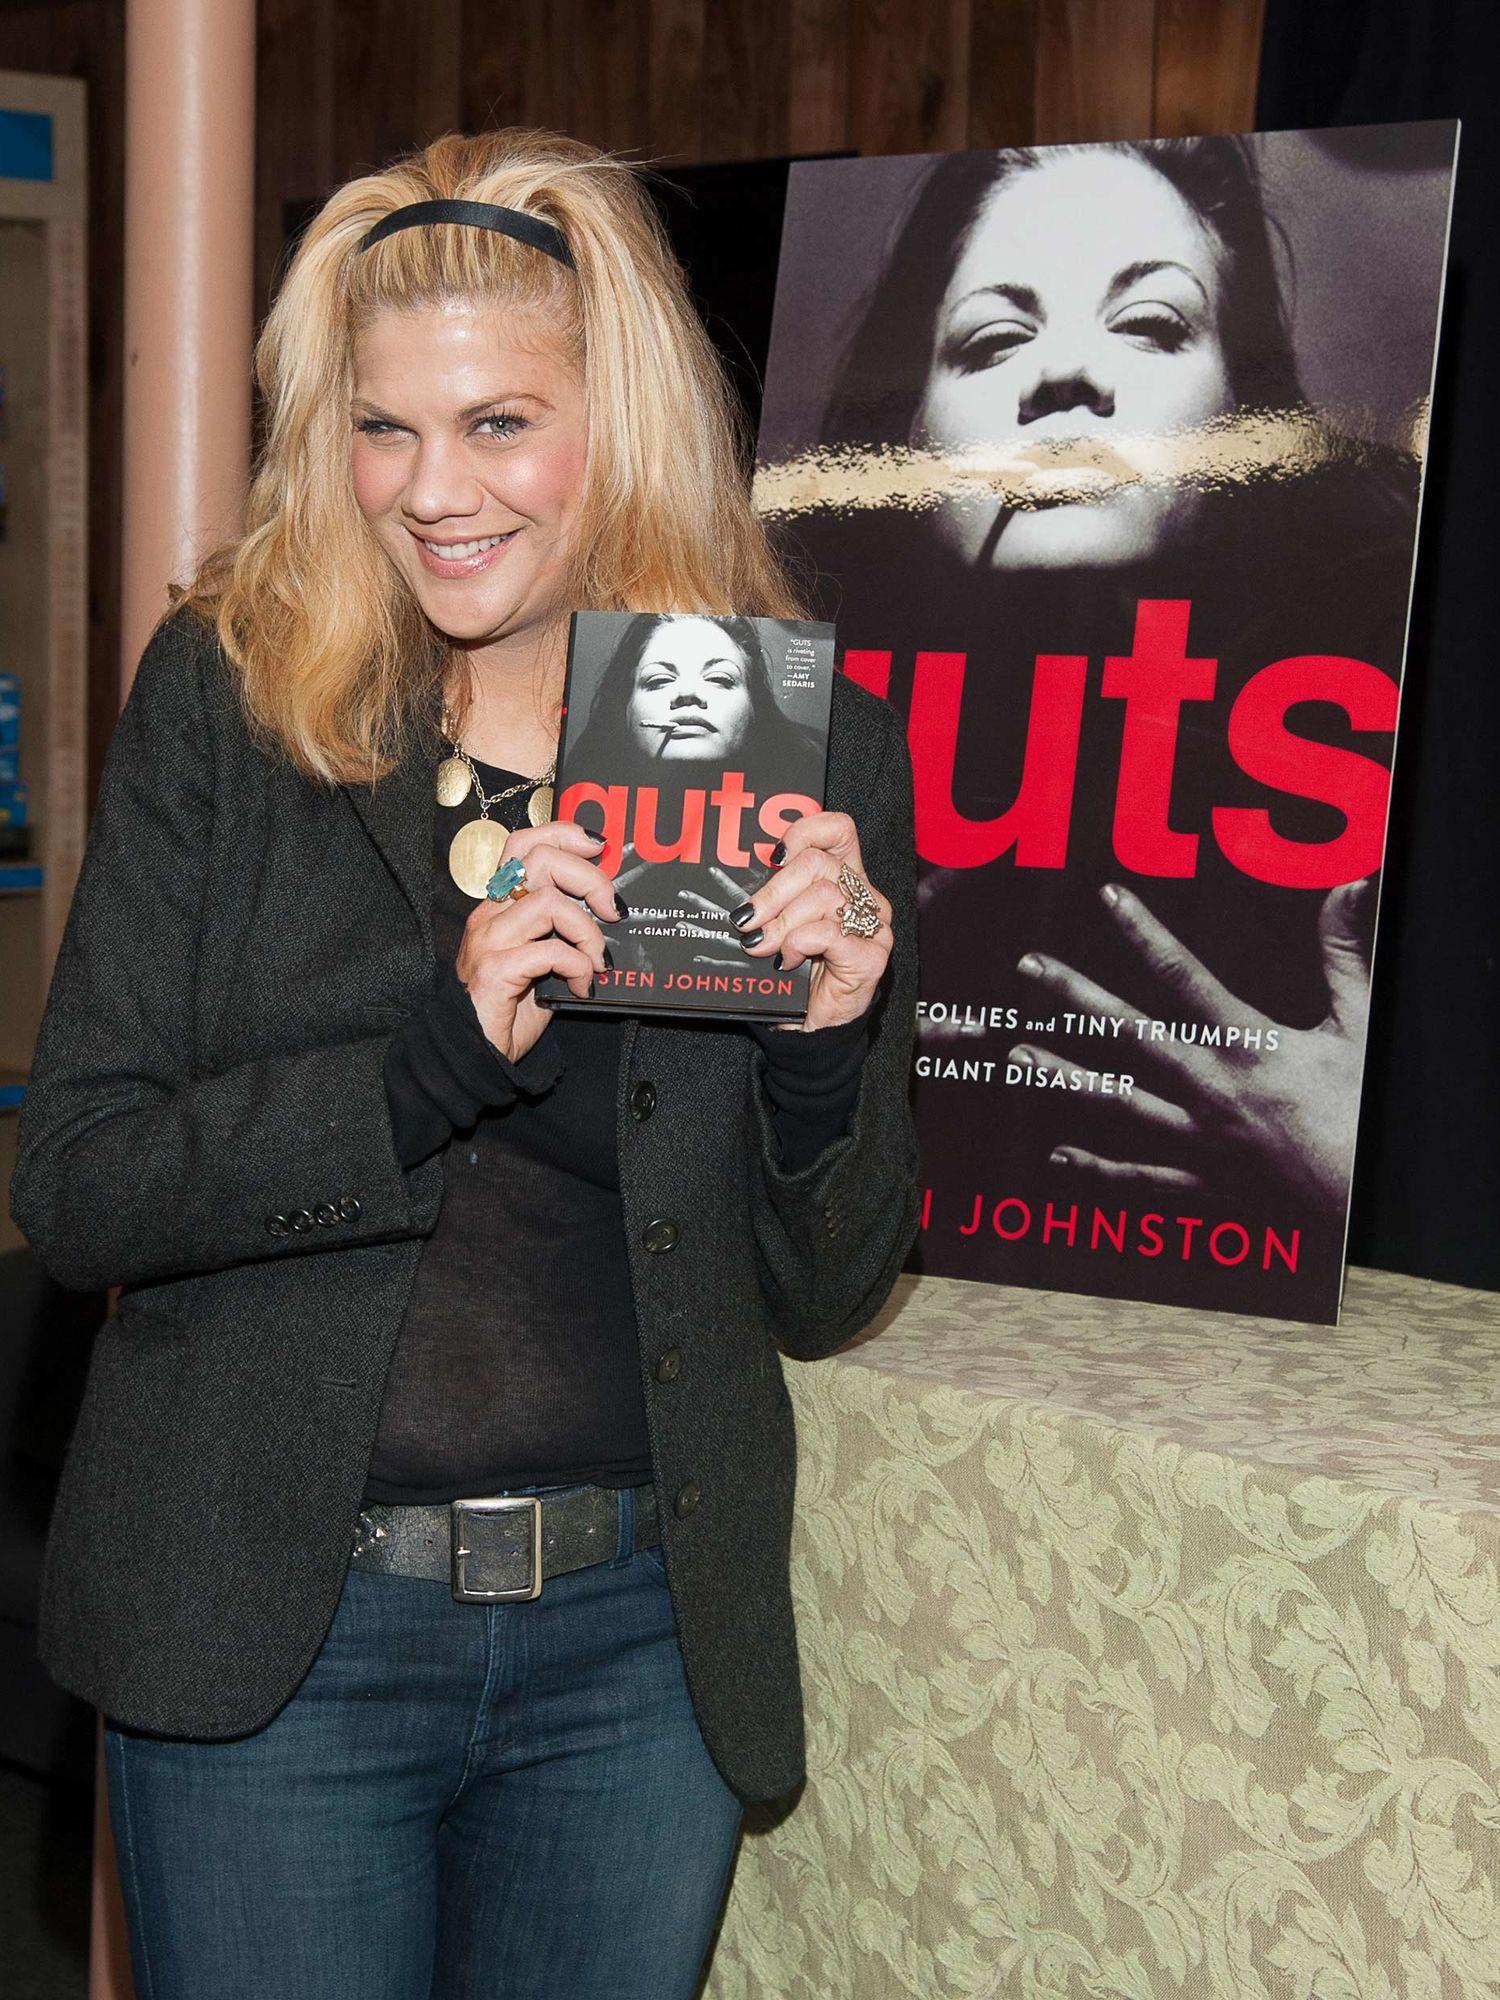 Actress Kristen Johnston promoting her memoir.